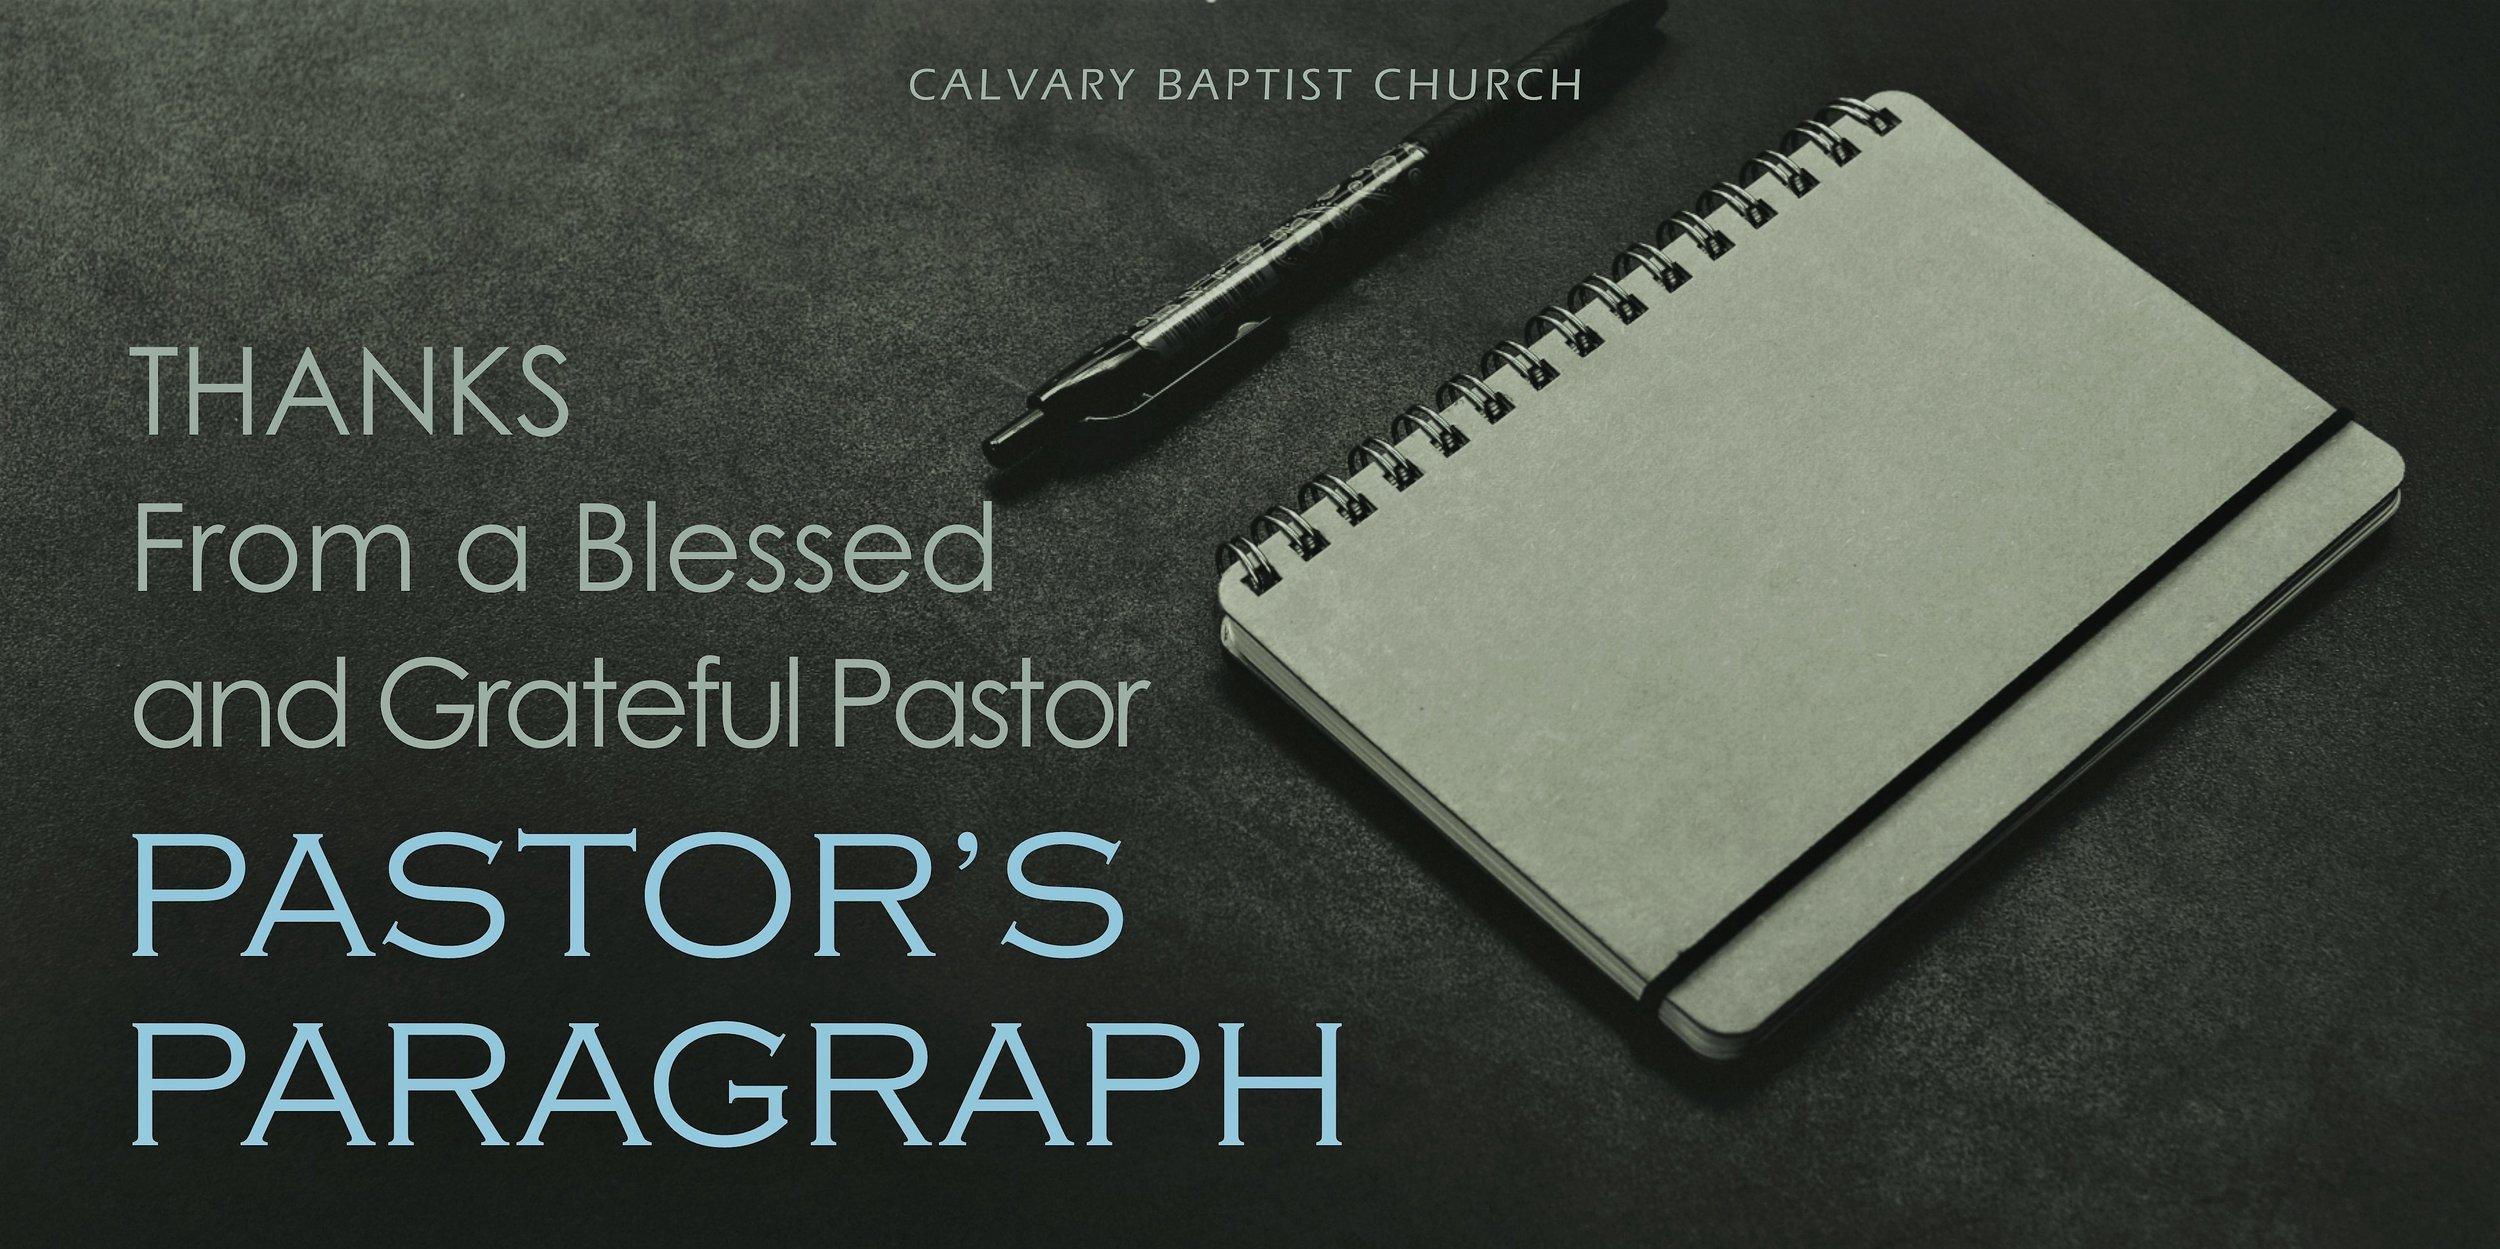 Pastors Paragraph Facebook 022819.jpg